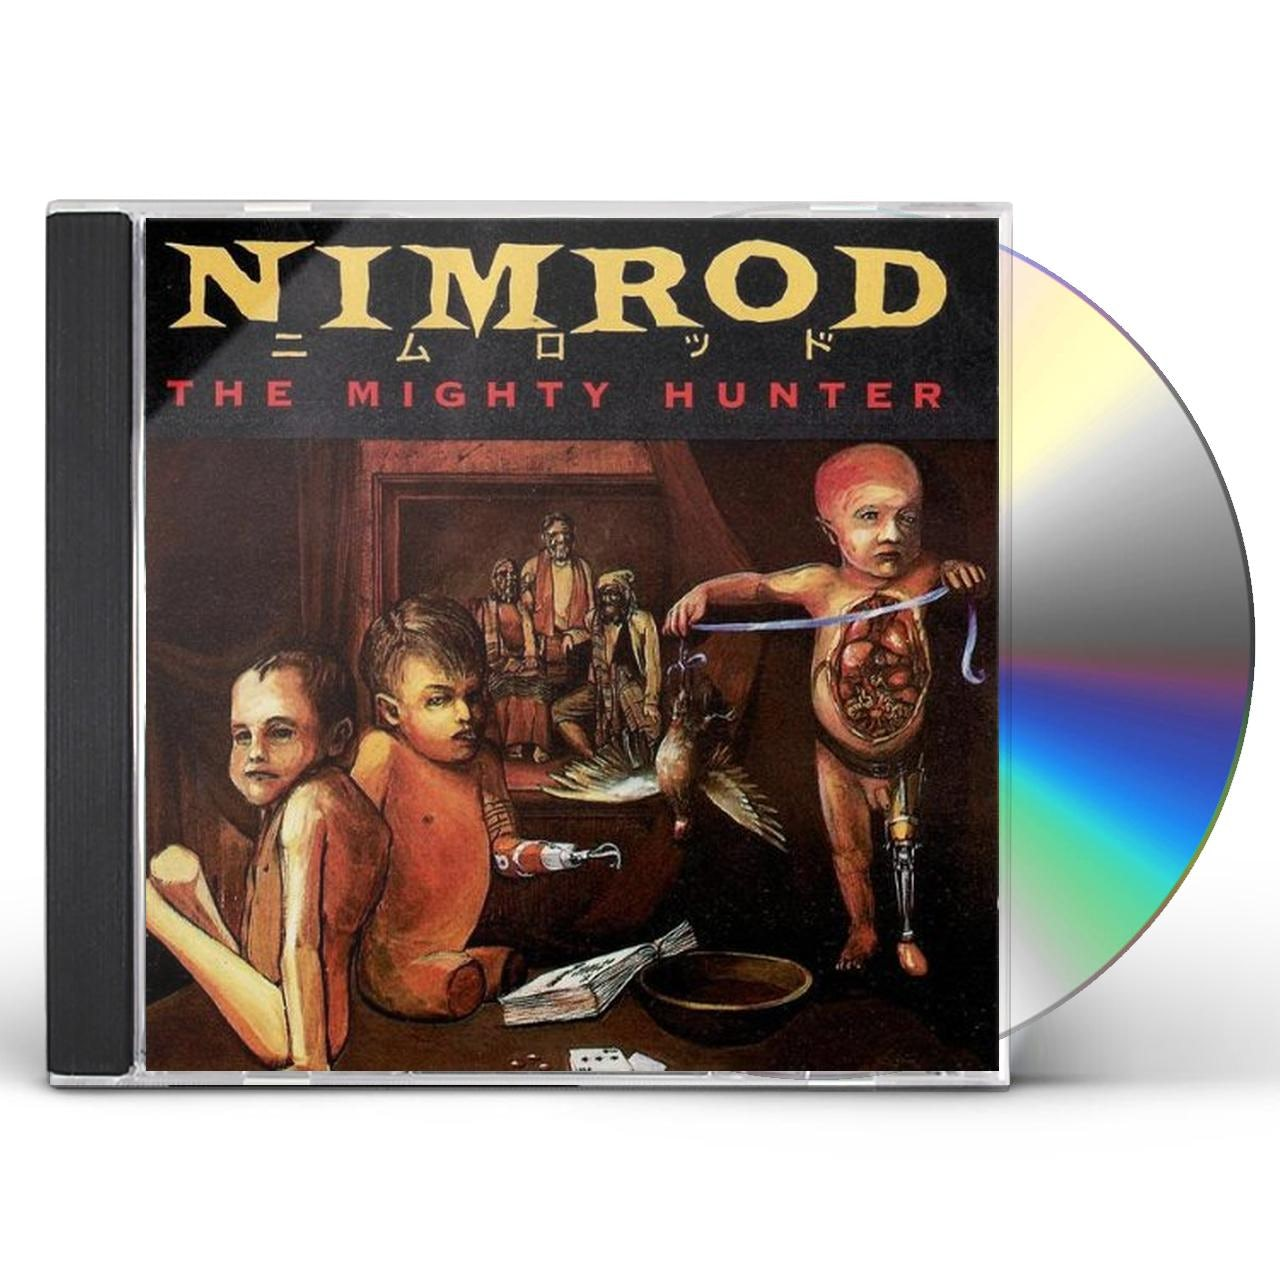 Hunter mighty nimrod the Genesis 10:9